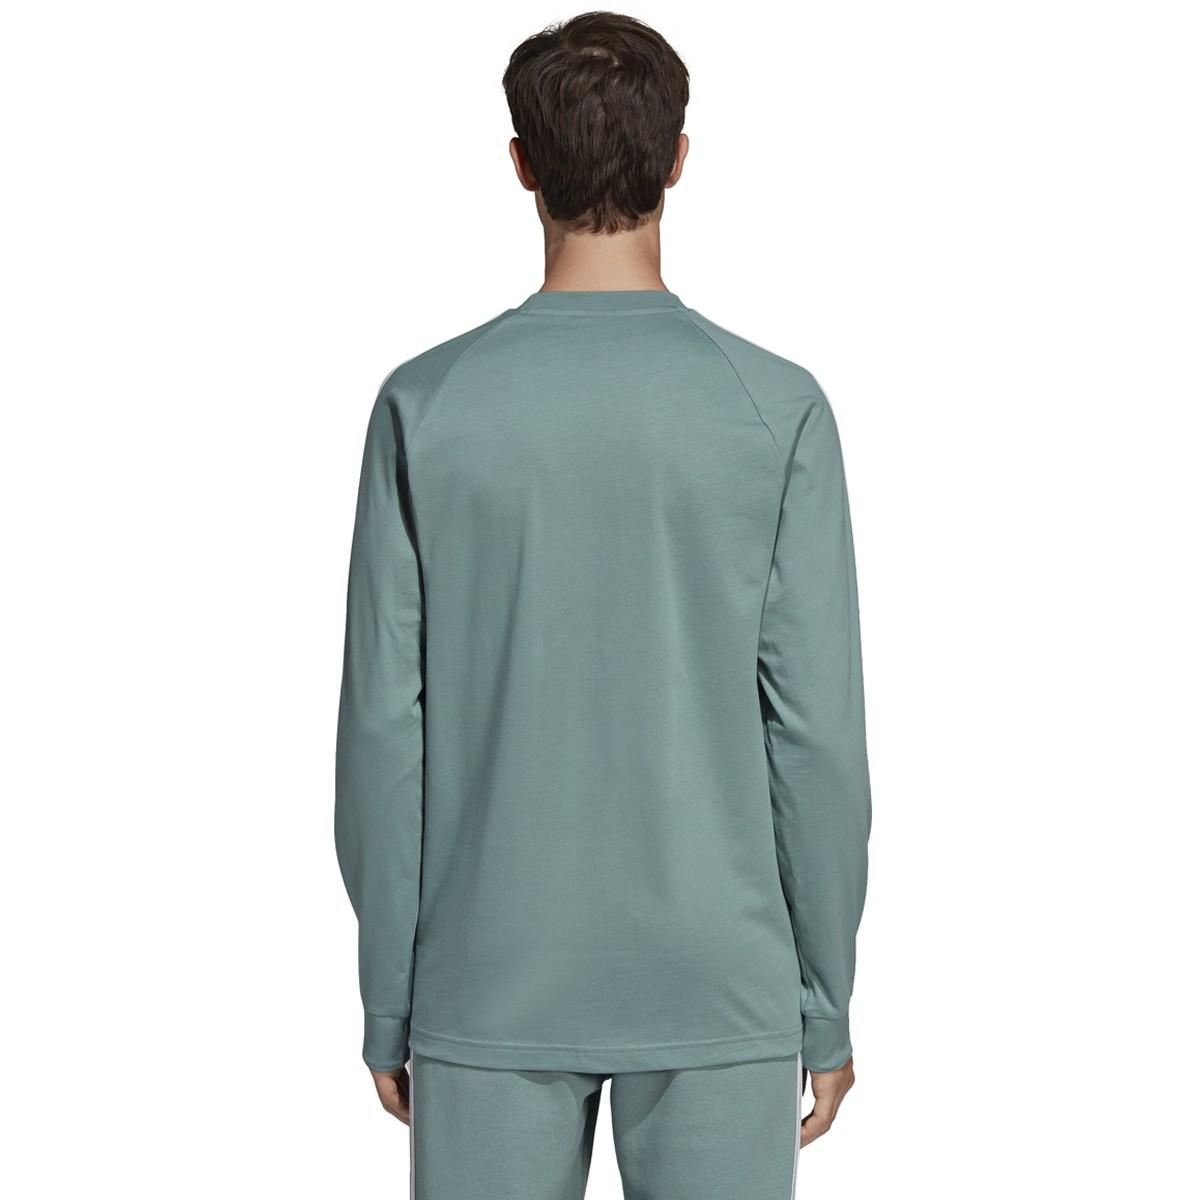 Adidas Long Sleeve 3 Stripe Tee Vapour Steel | END.